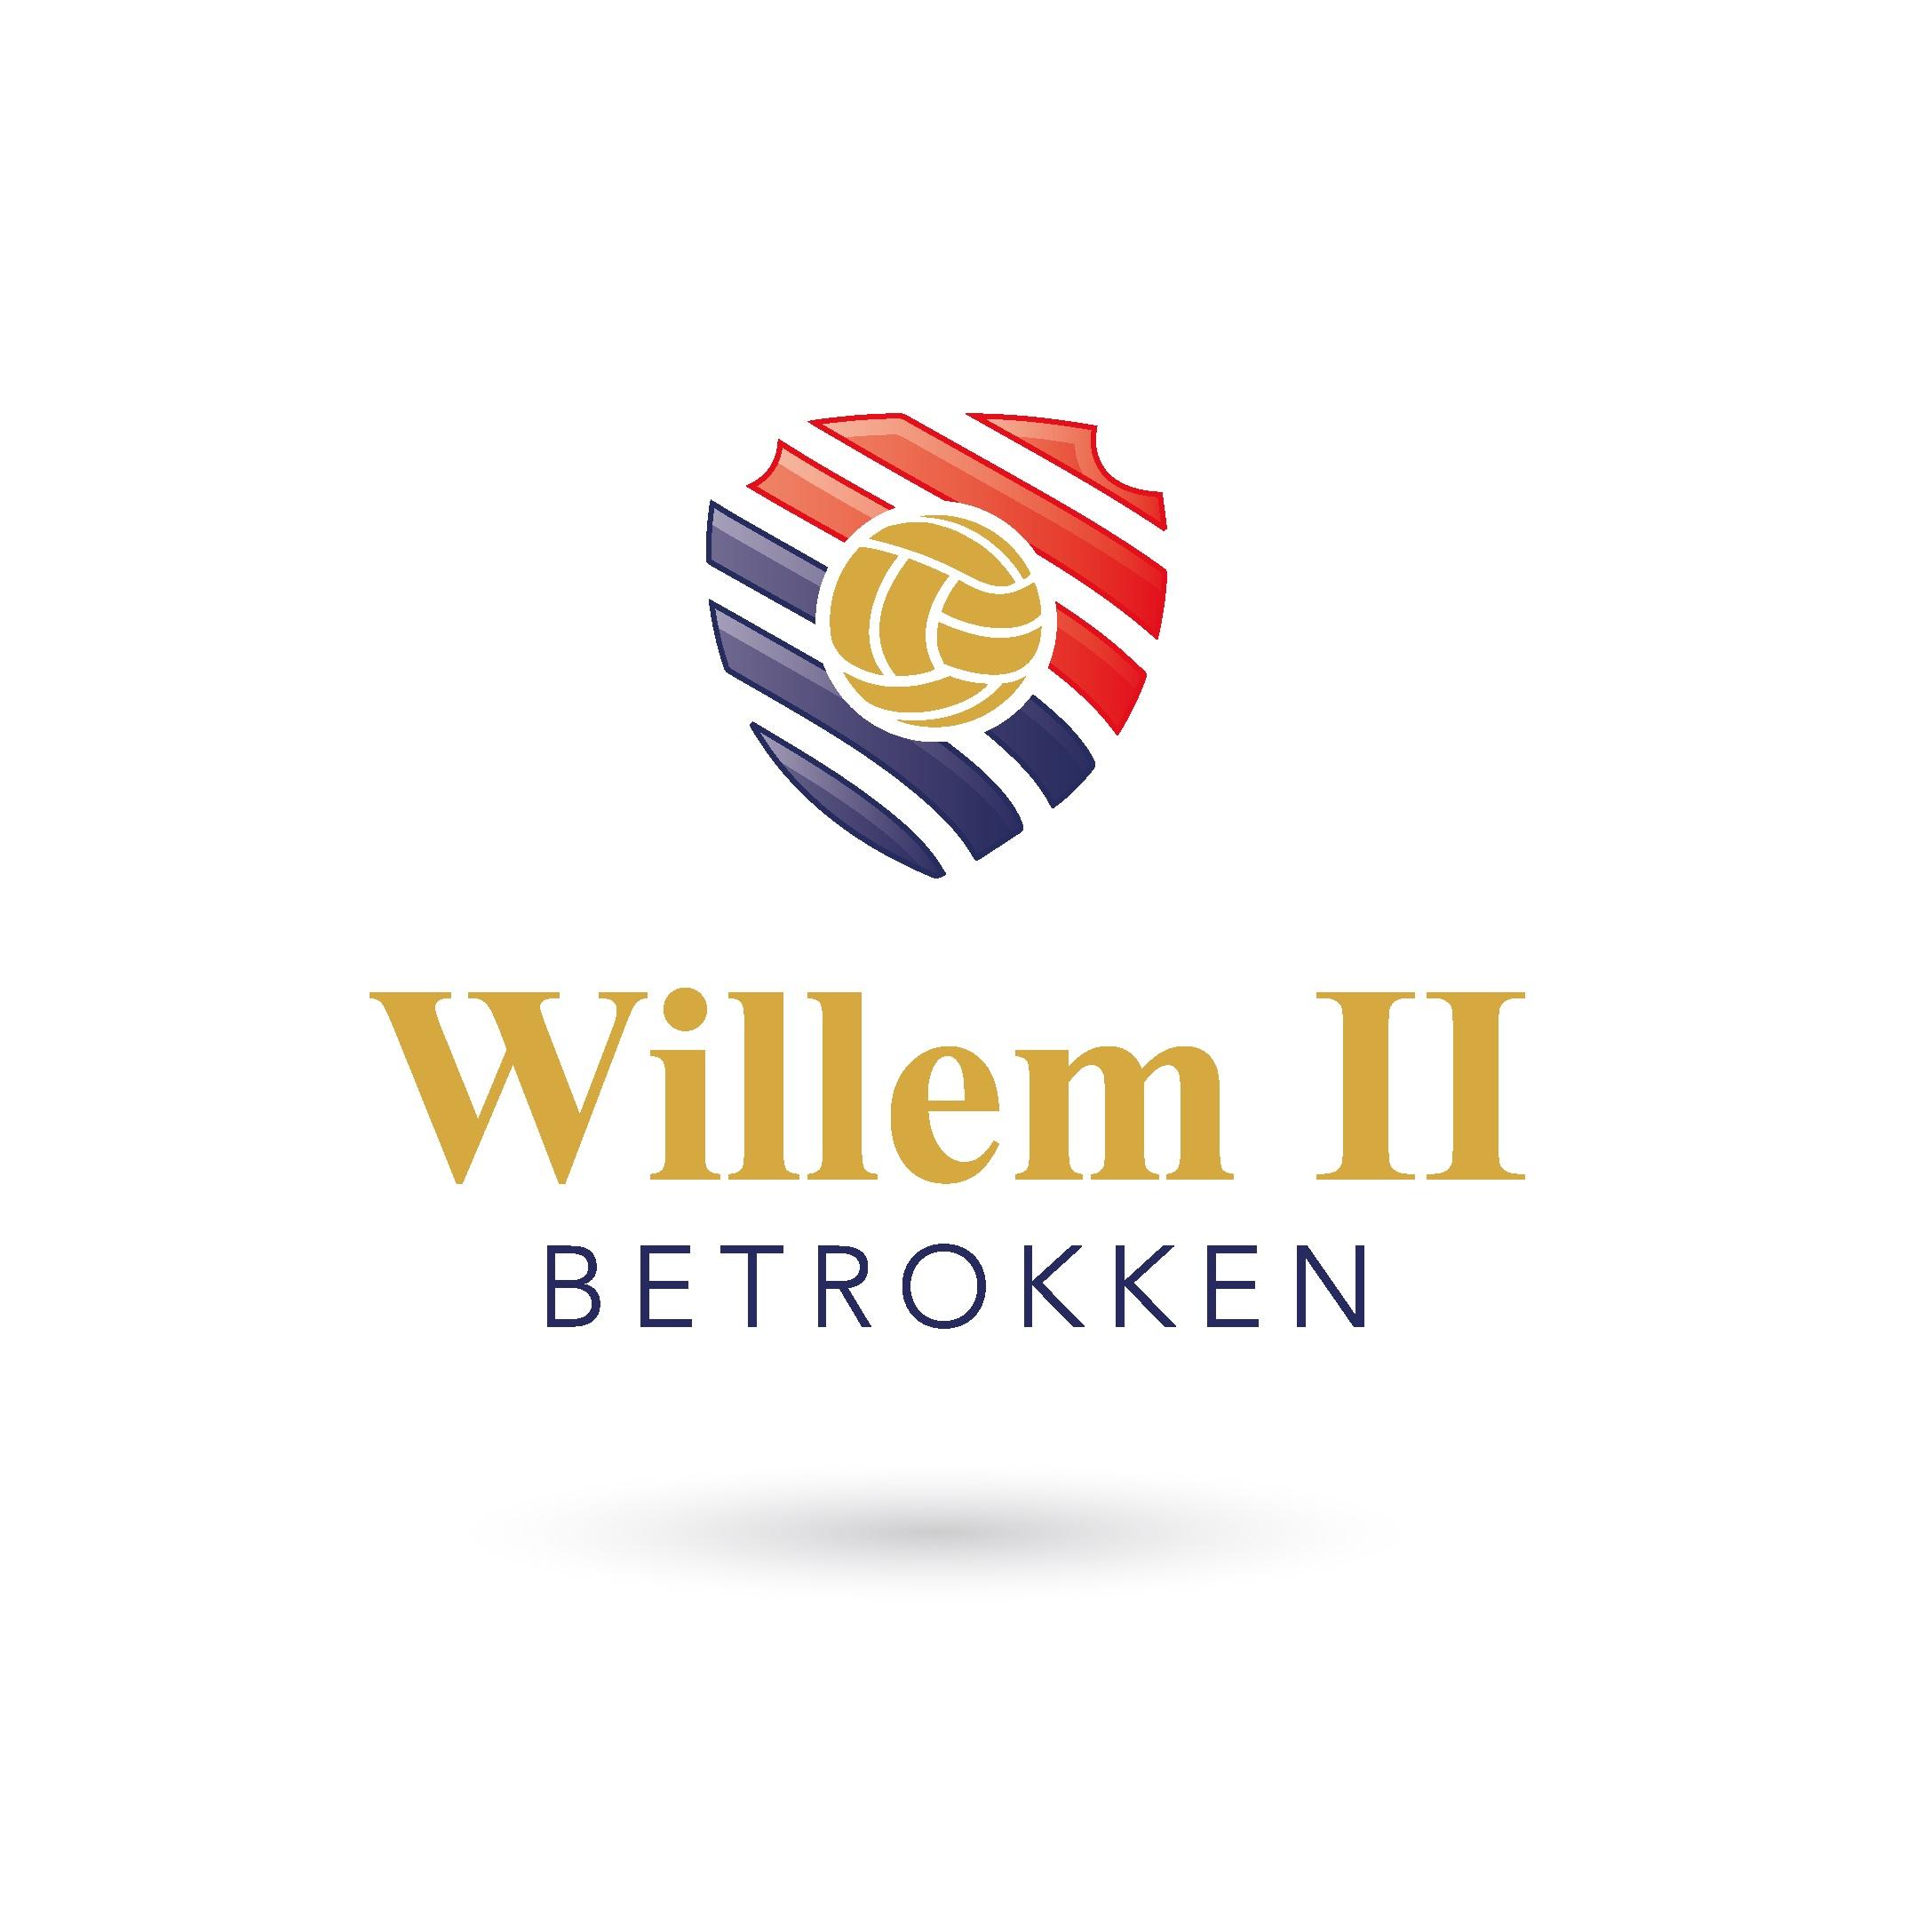 Willem II Betrokken